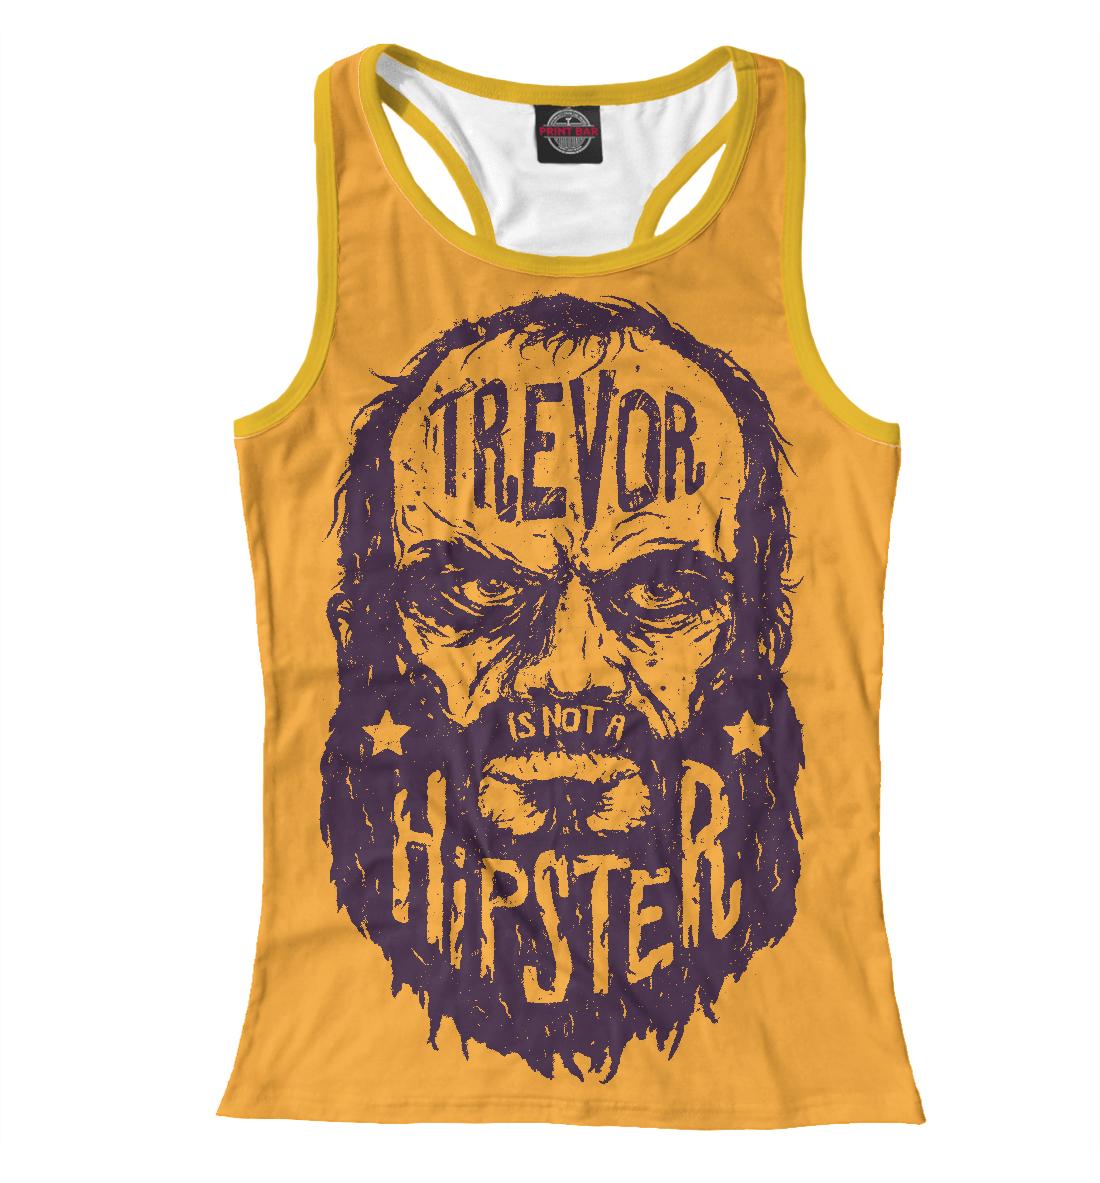 Купить Тревор не хипстер, Printbar, Майки борцовки, HIP-796339-mayb-1